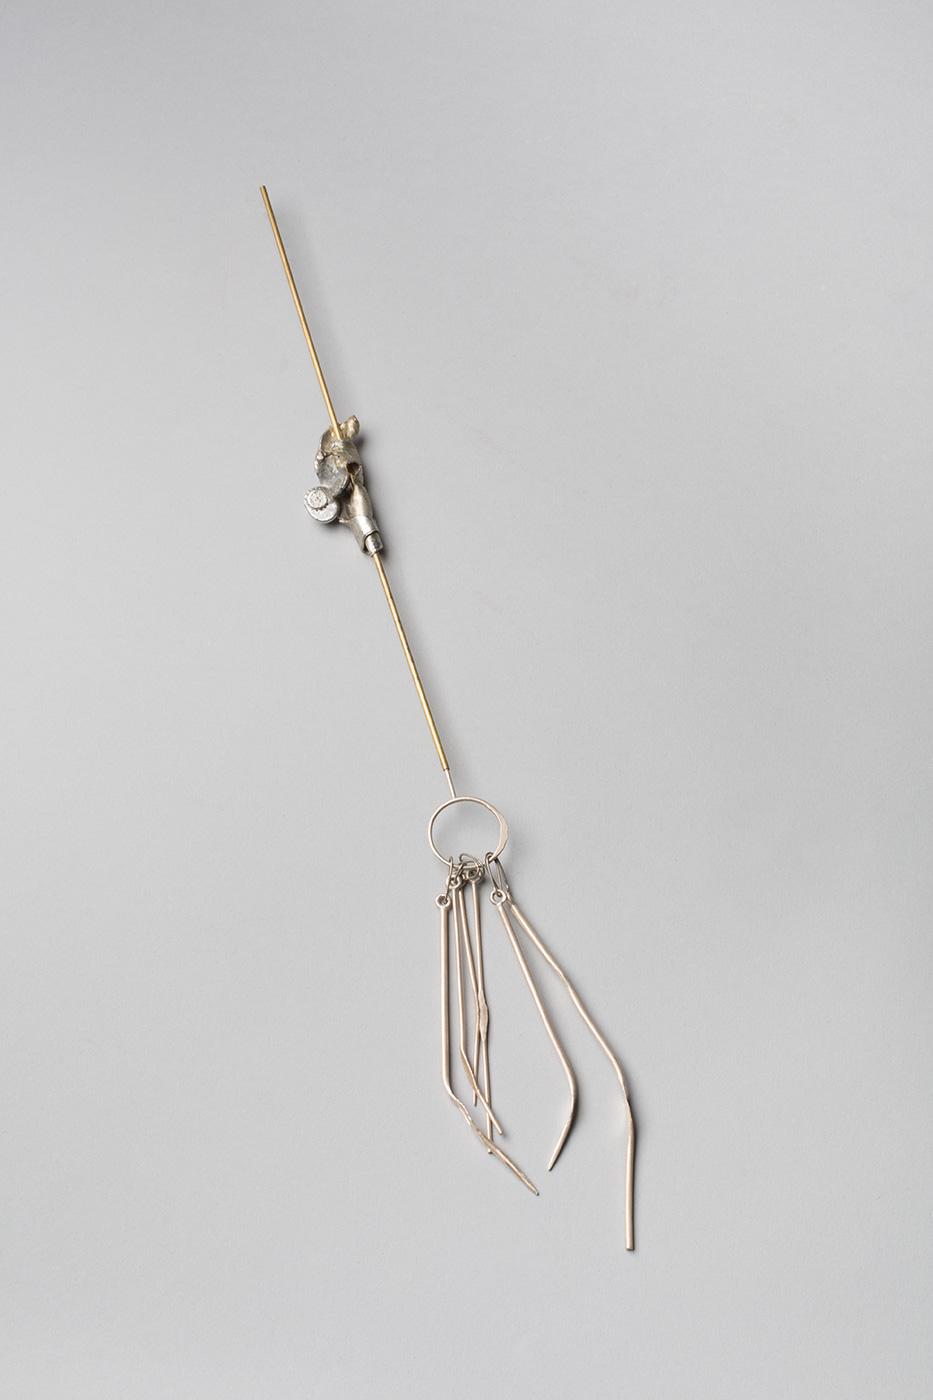 Amina Rizwan - Warp Stick and Objects (Unembroidered series)